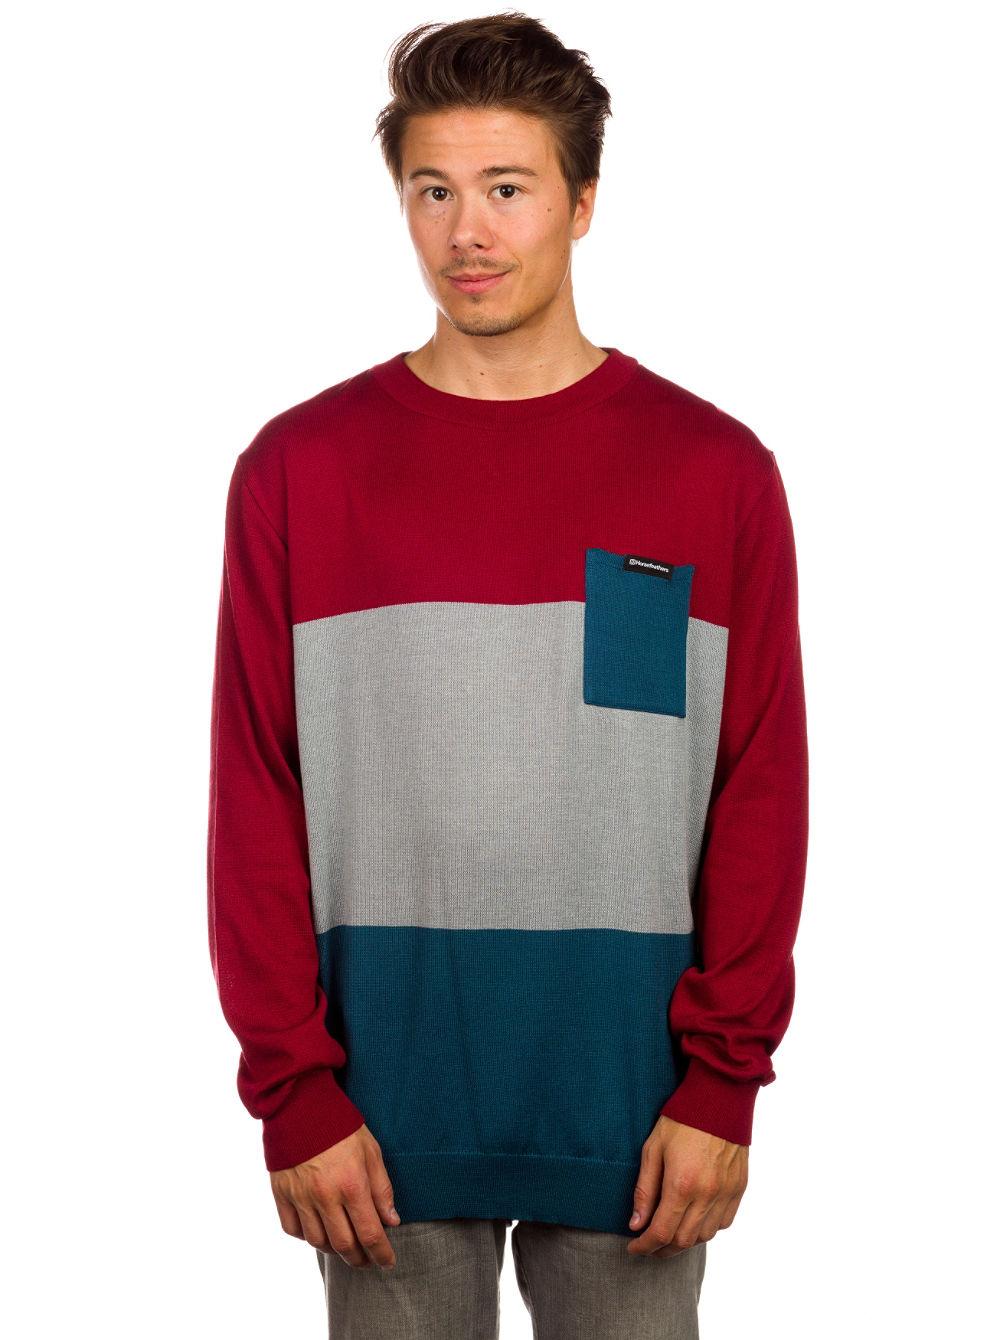 advice-pullover